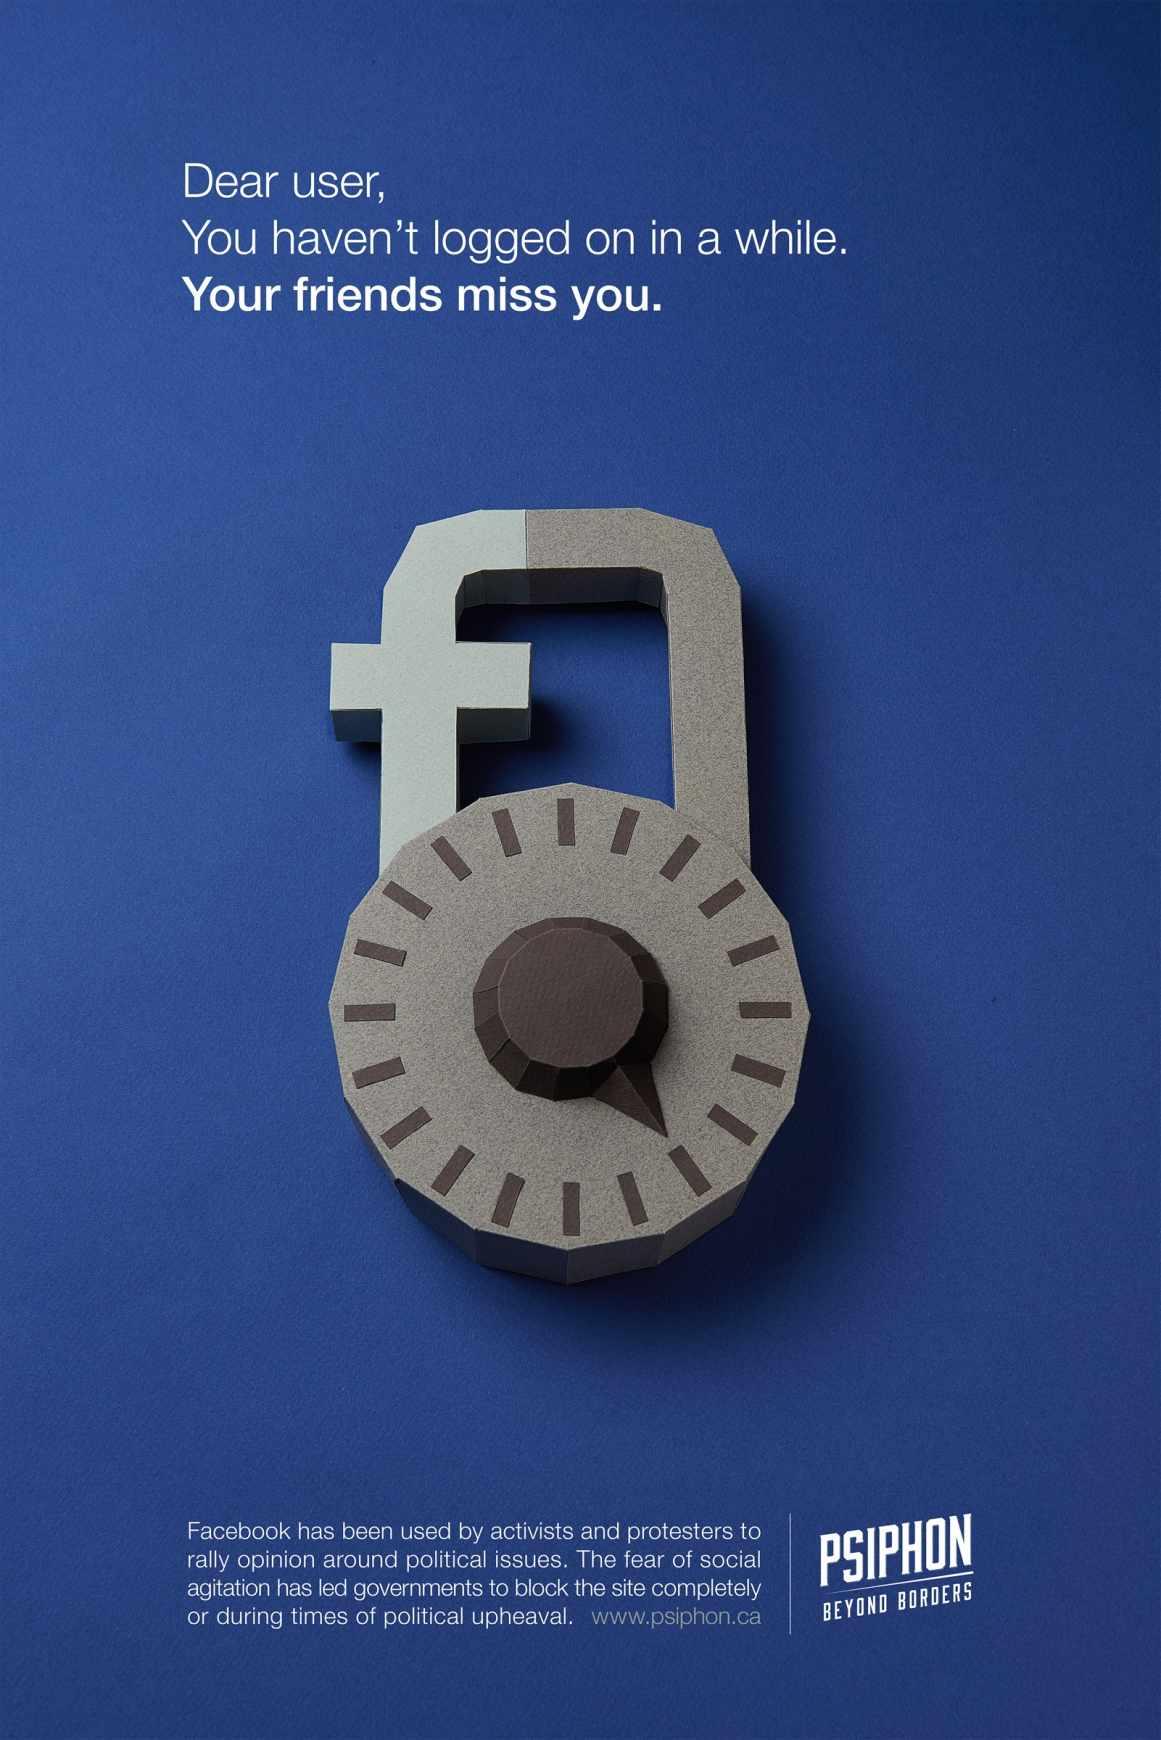 dans-ta-pub-social-media-censure-liberte-expression-psiphon-5